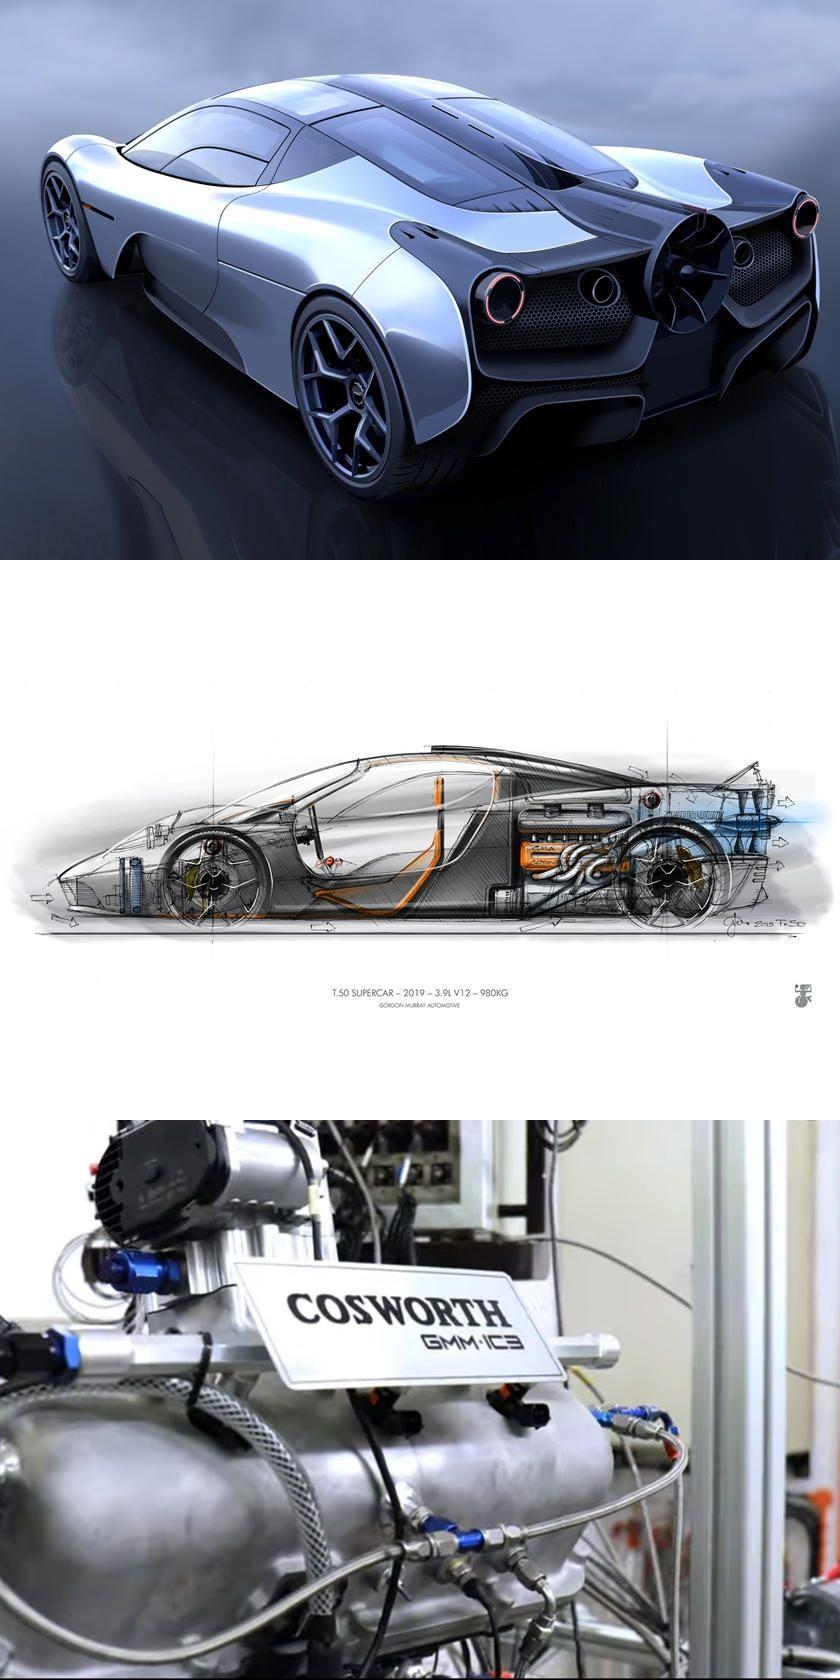 Mclaren F1 Designer S New Supercar Sounds Incredible Listen To The T 50 Supercar Rev All The Way To 12100 Rpm In 2020 Super Cars Mclaren F1 Mclaren